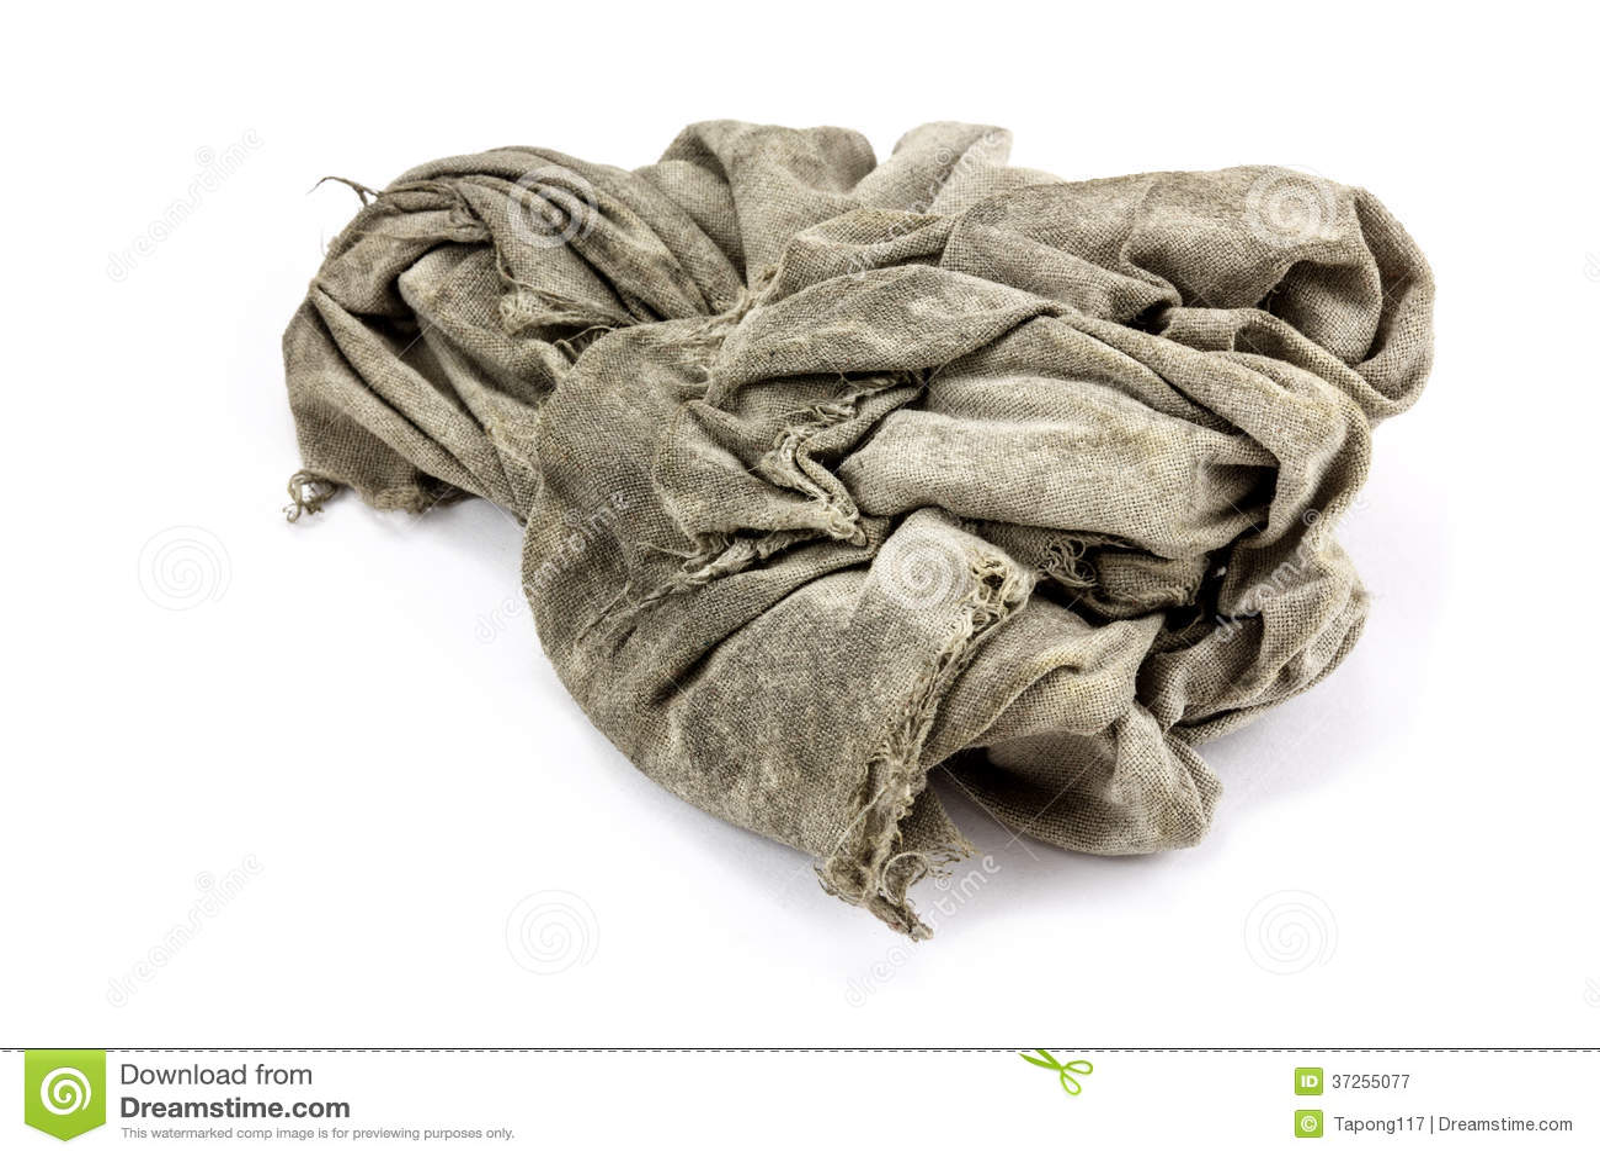 9a6210fb3f14b Dirty rag stock image. Image of horizontal, clean, blue - 37255077